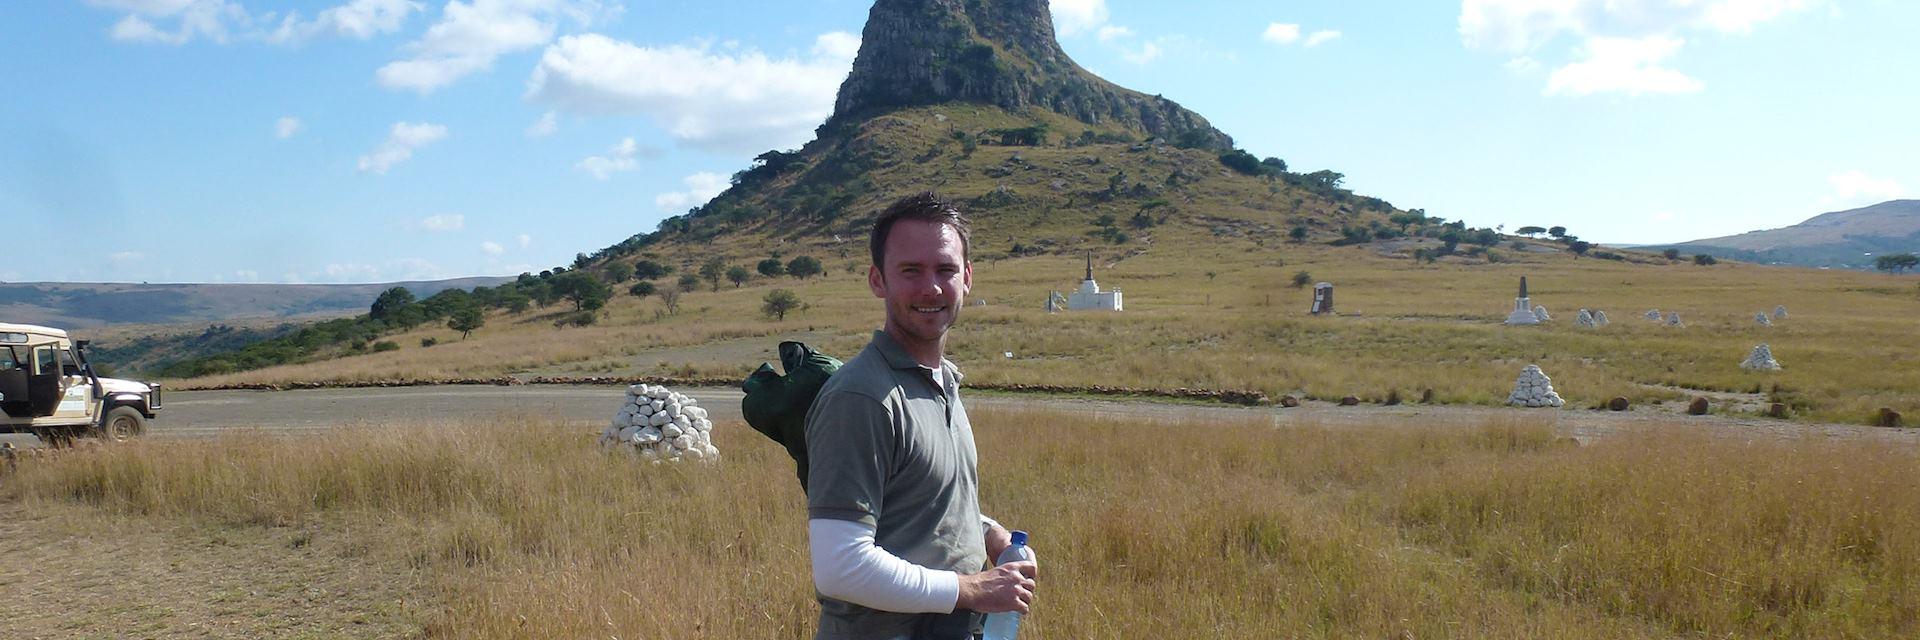 Anthony at Isandlwana for a battlefields tour, Kwa-Zulu Natal